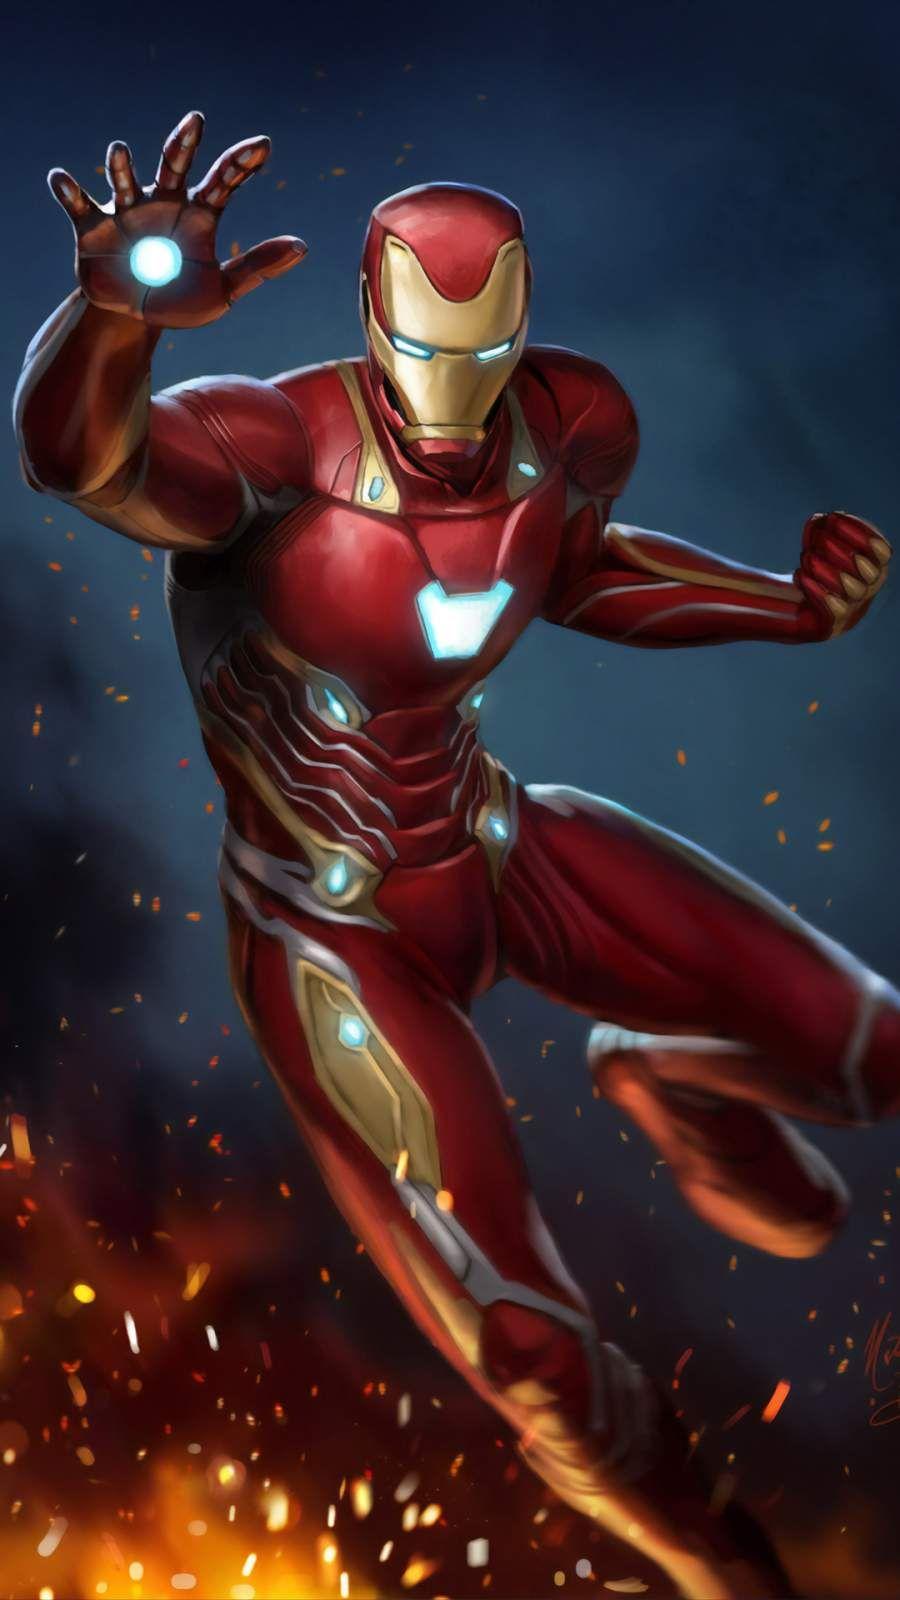 Art Iron Man Mark 50 Iphone Wallpaper With Images Iron Man Art